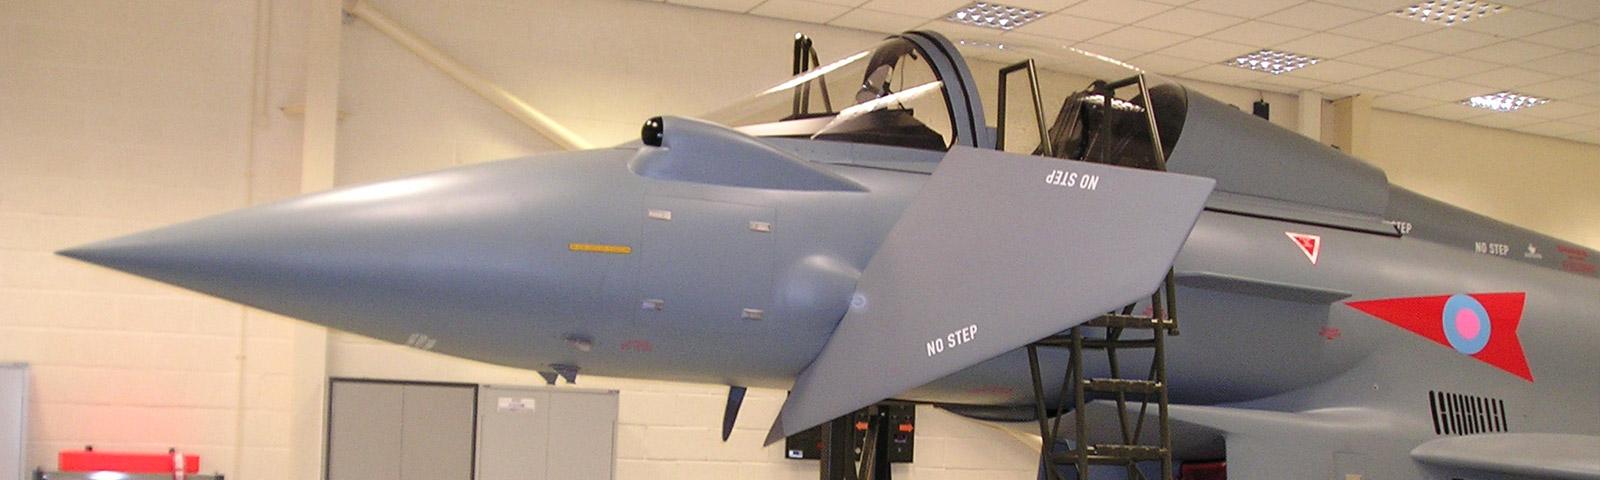 <h1>可靠的大價值機艙乘員訓練模擬器</h1><a href='/zh/defence/simulators/'>找到更多</a>